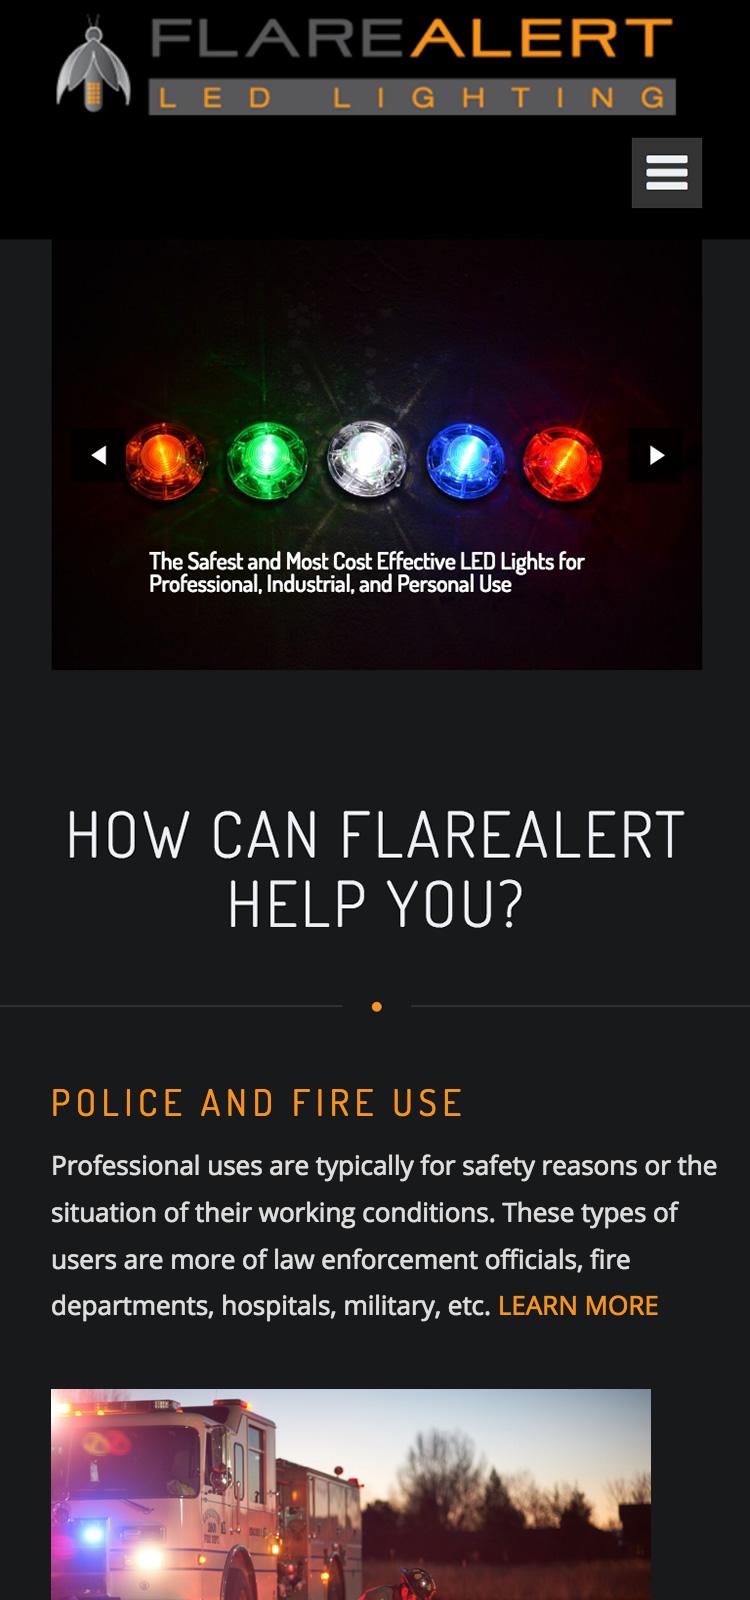 flarealert_phone1